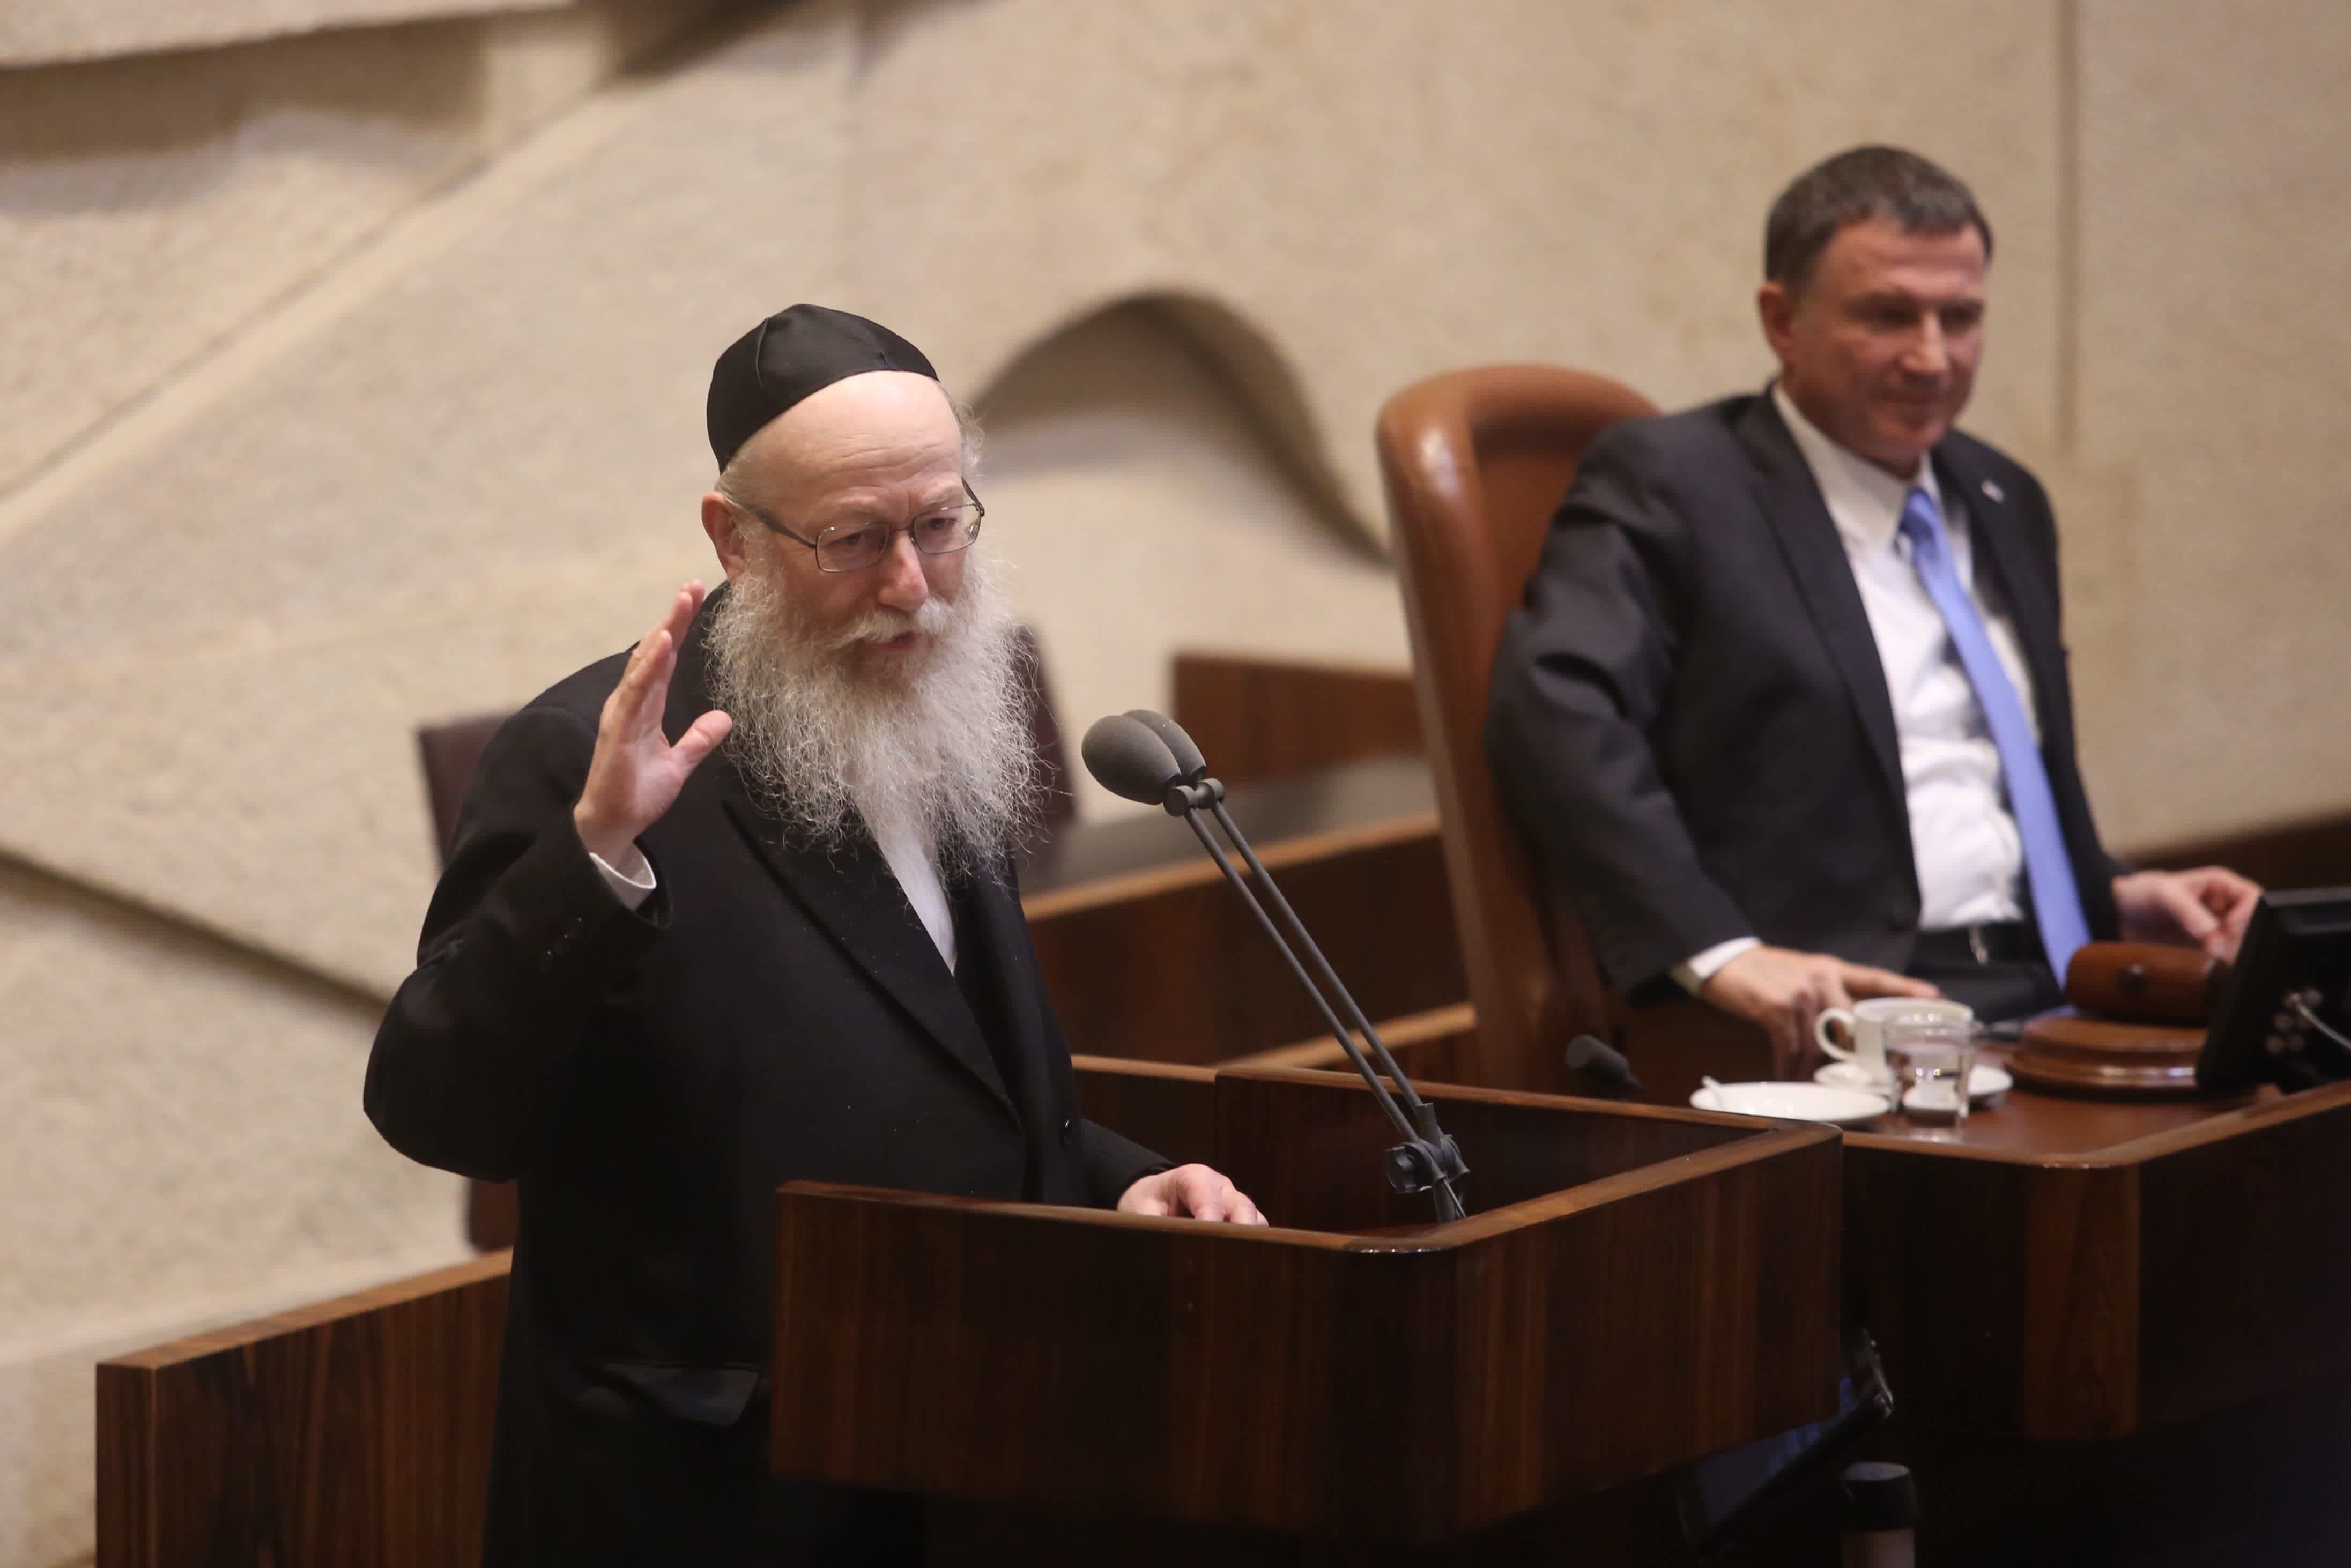 Health Minister Ya'acov Litzman at the Knesset plenum discussing goverment allowances for the handicap, September 18, 2017. (Marc Israel Sellem/The Jerusalem Post)